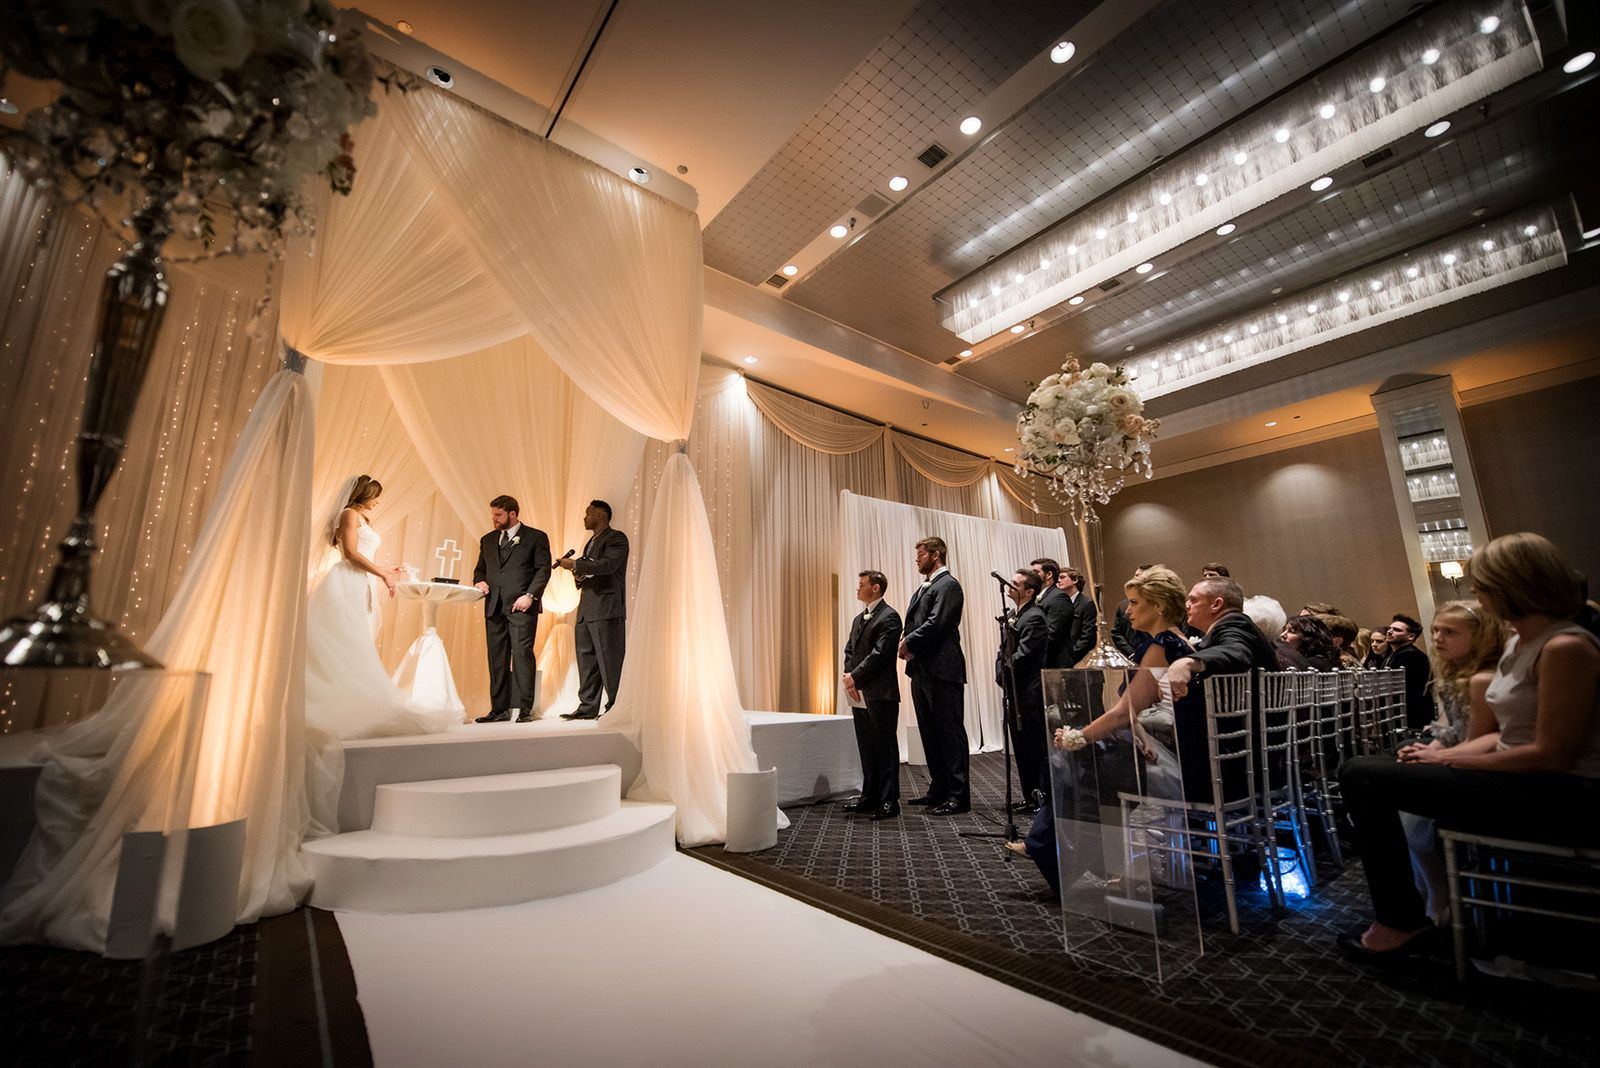 Wedding Ceremony Hotel Arista Naperville Illinois Hotel Wedding Ceremony Wedding Ceremony Hotel Wedding